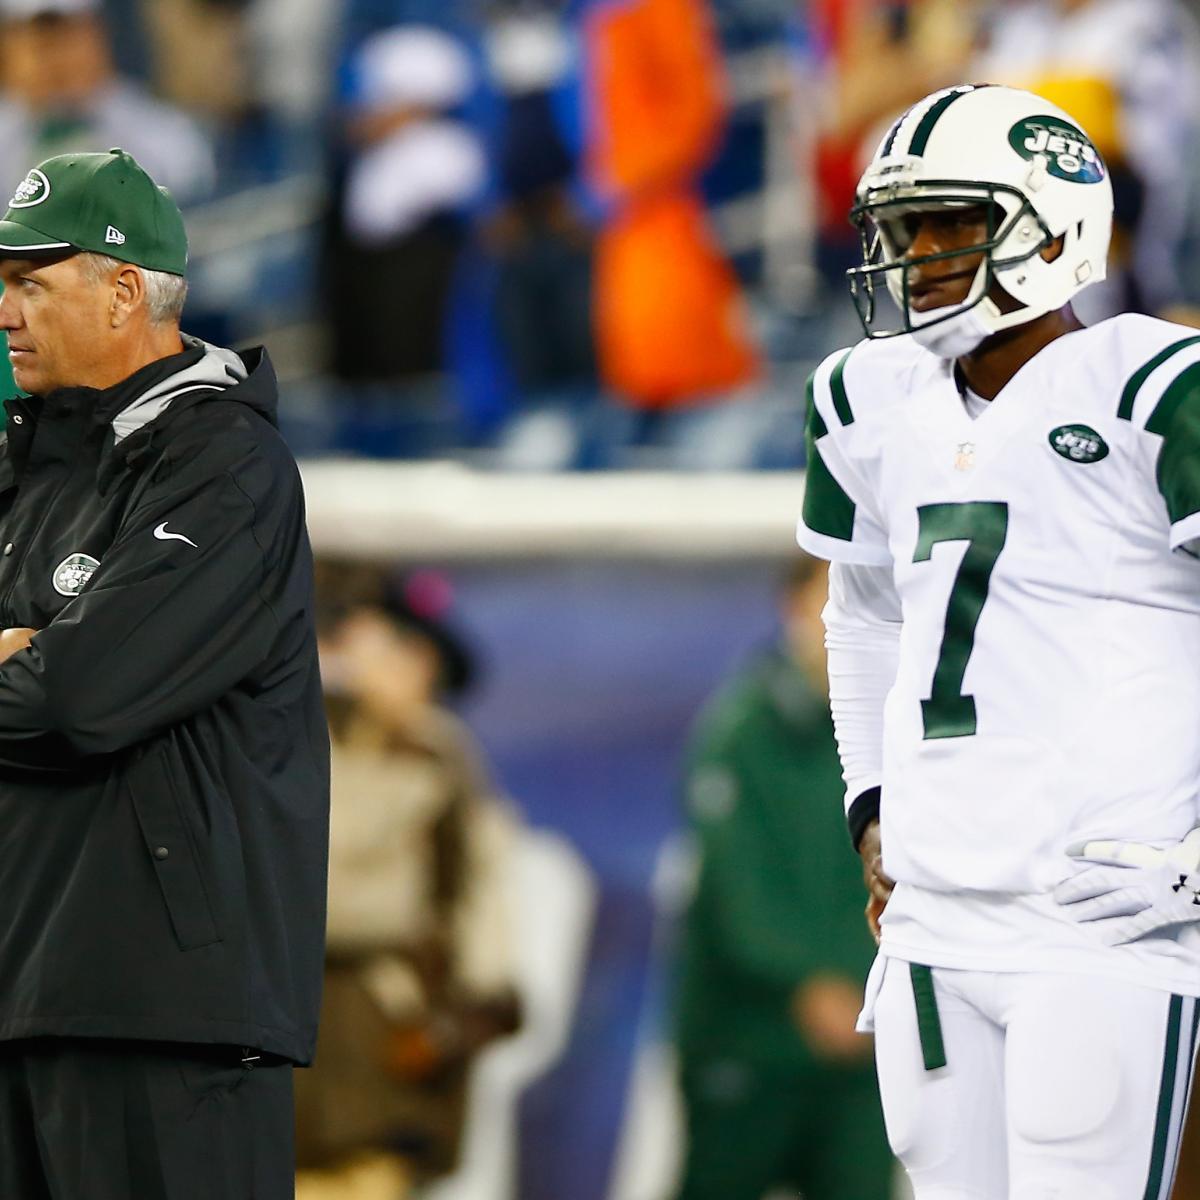 NY Jets Rumors: Geno Smith, Bryce Petty Battle After Ryan